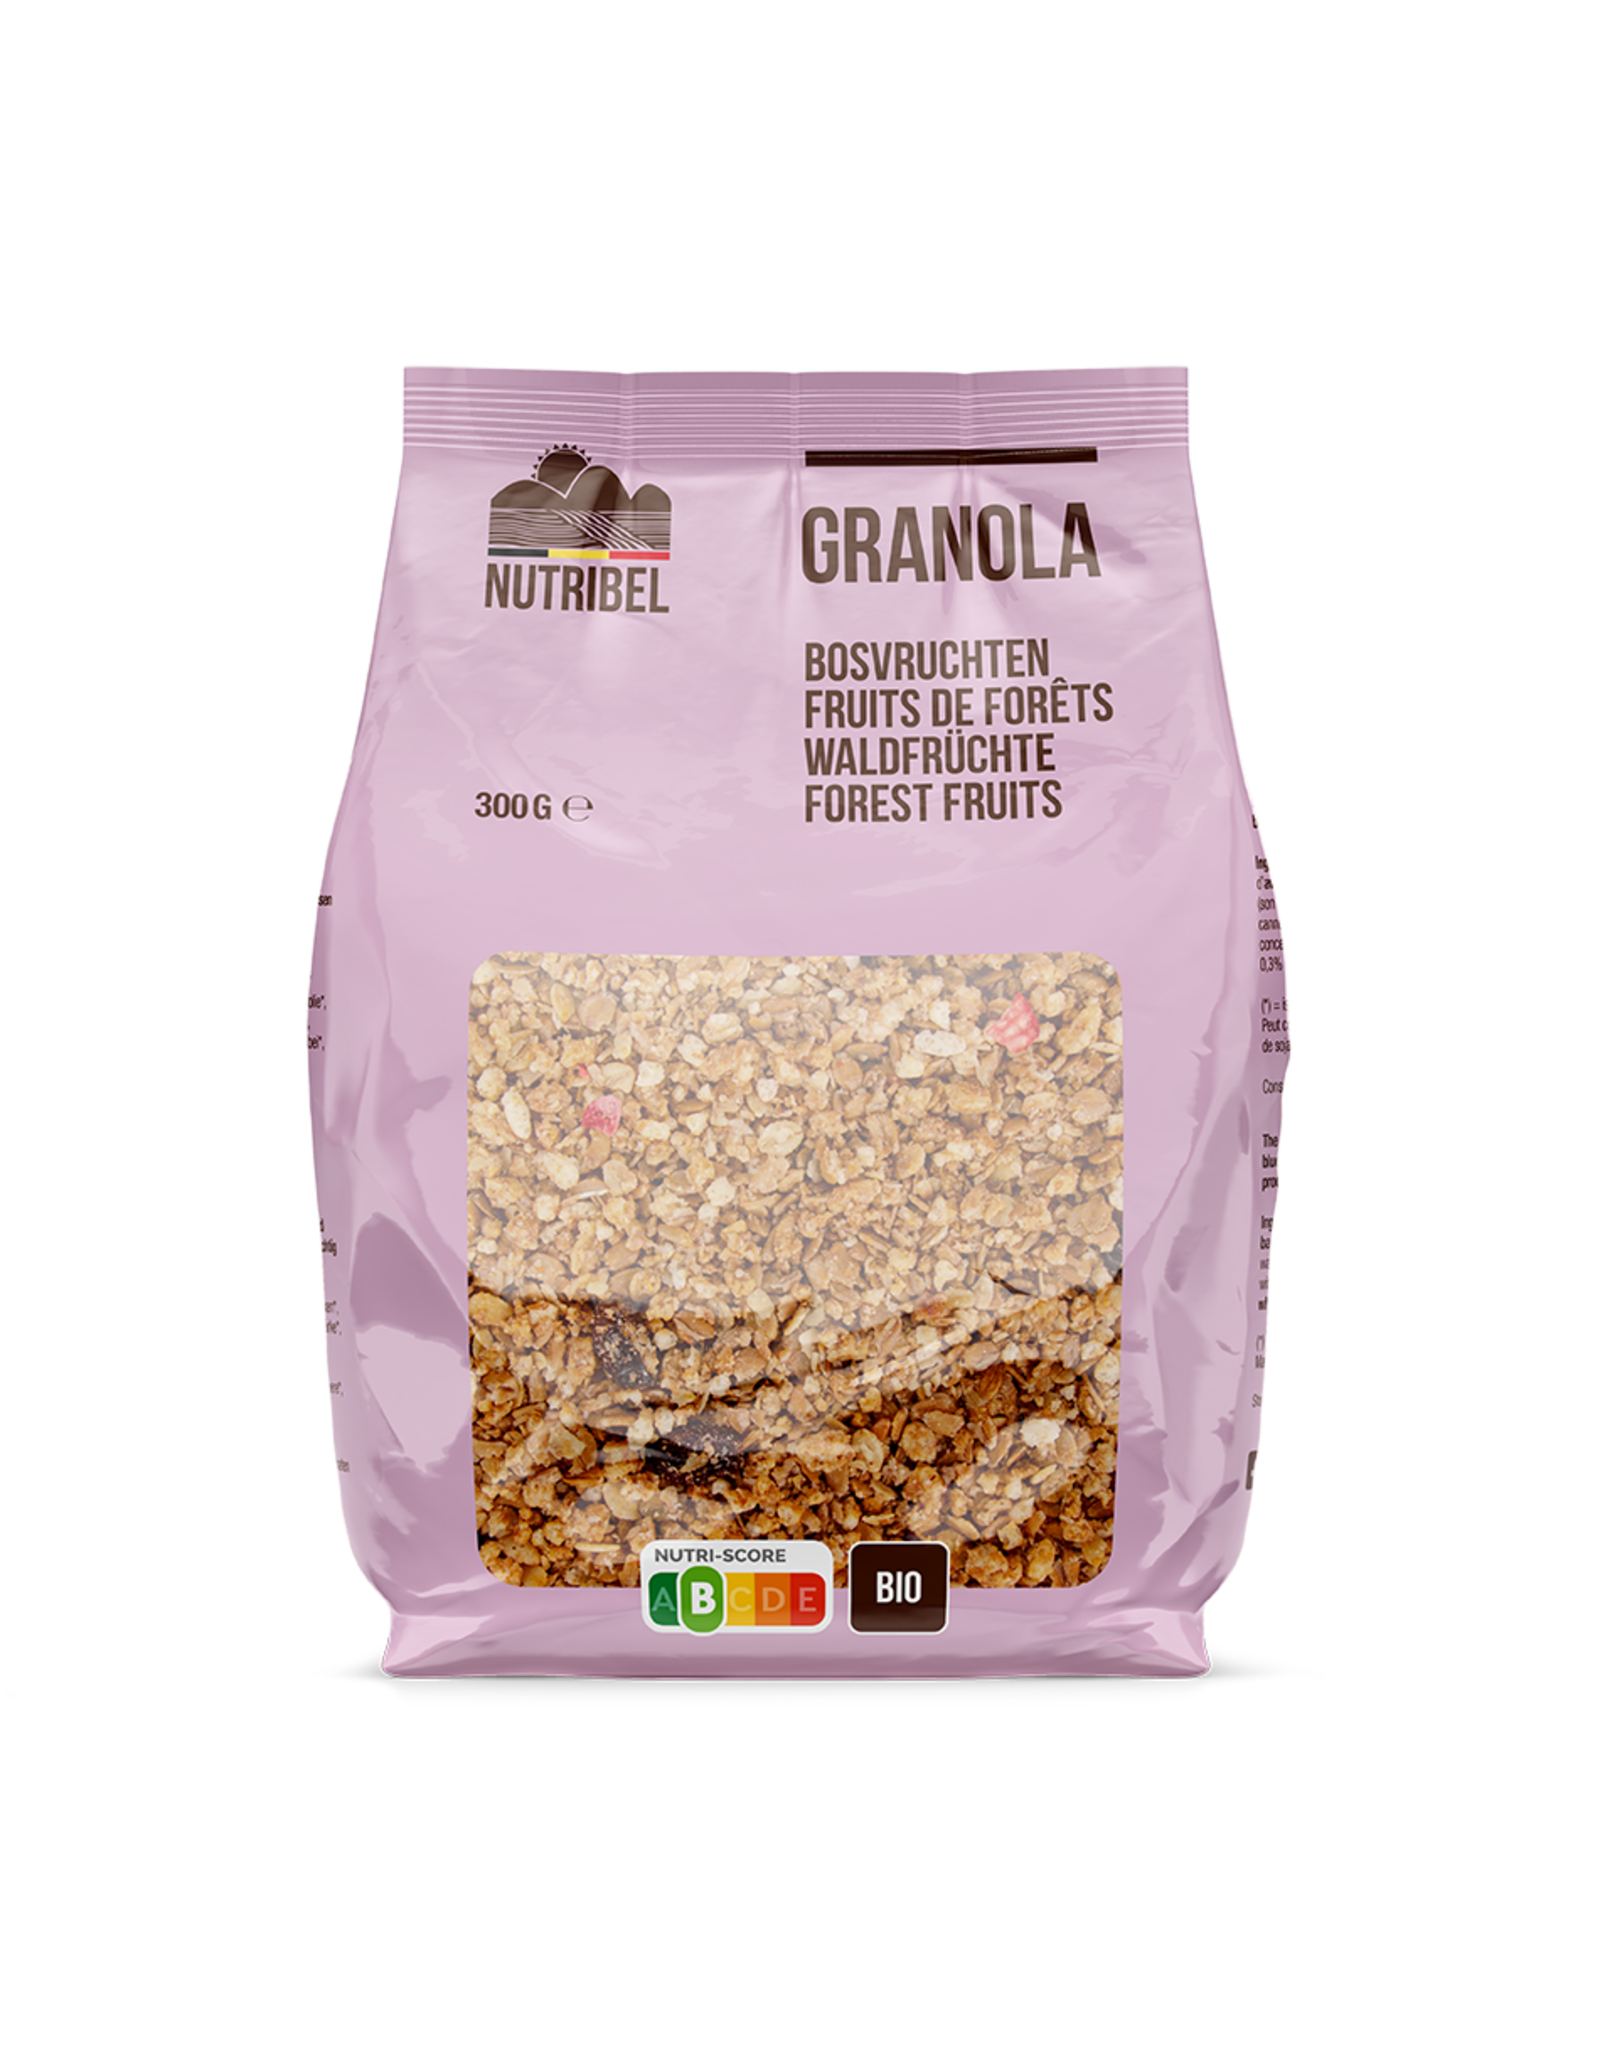 Nutribel Granola bosvruchten bio 300g